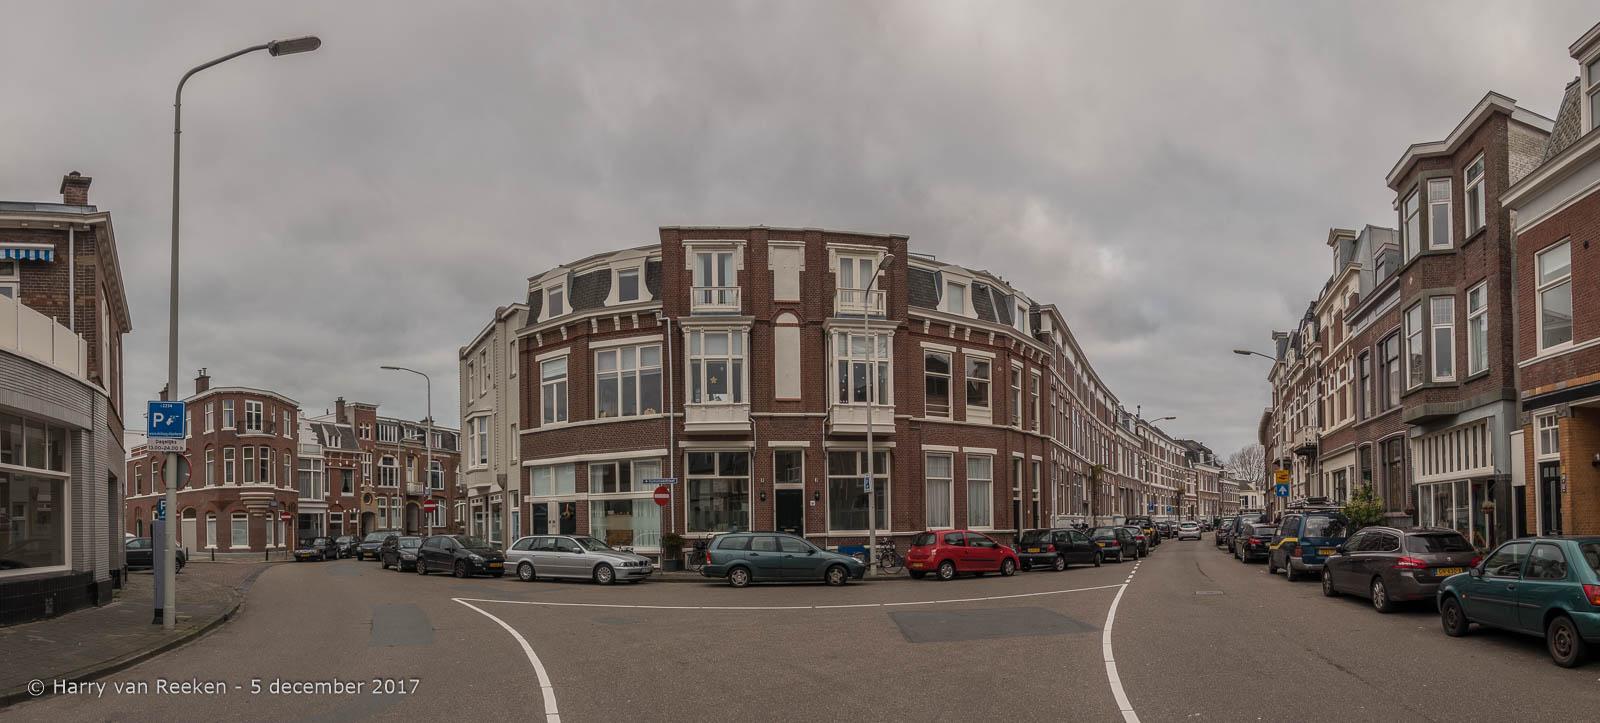 Symonszstraat-Pansierstraat - pano